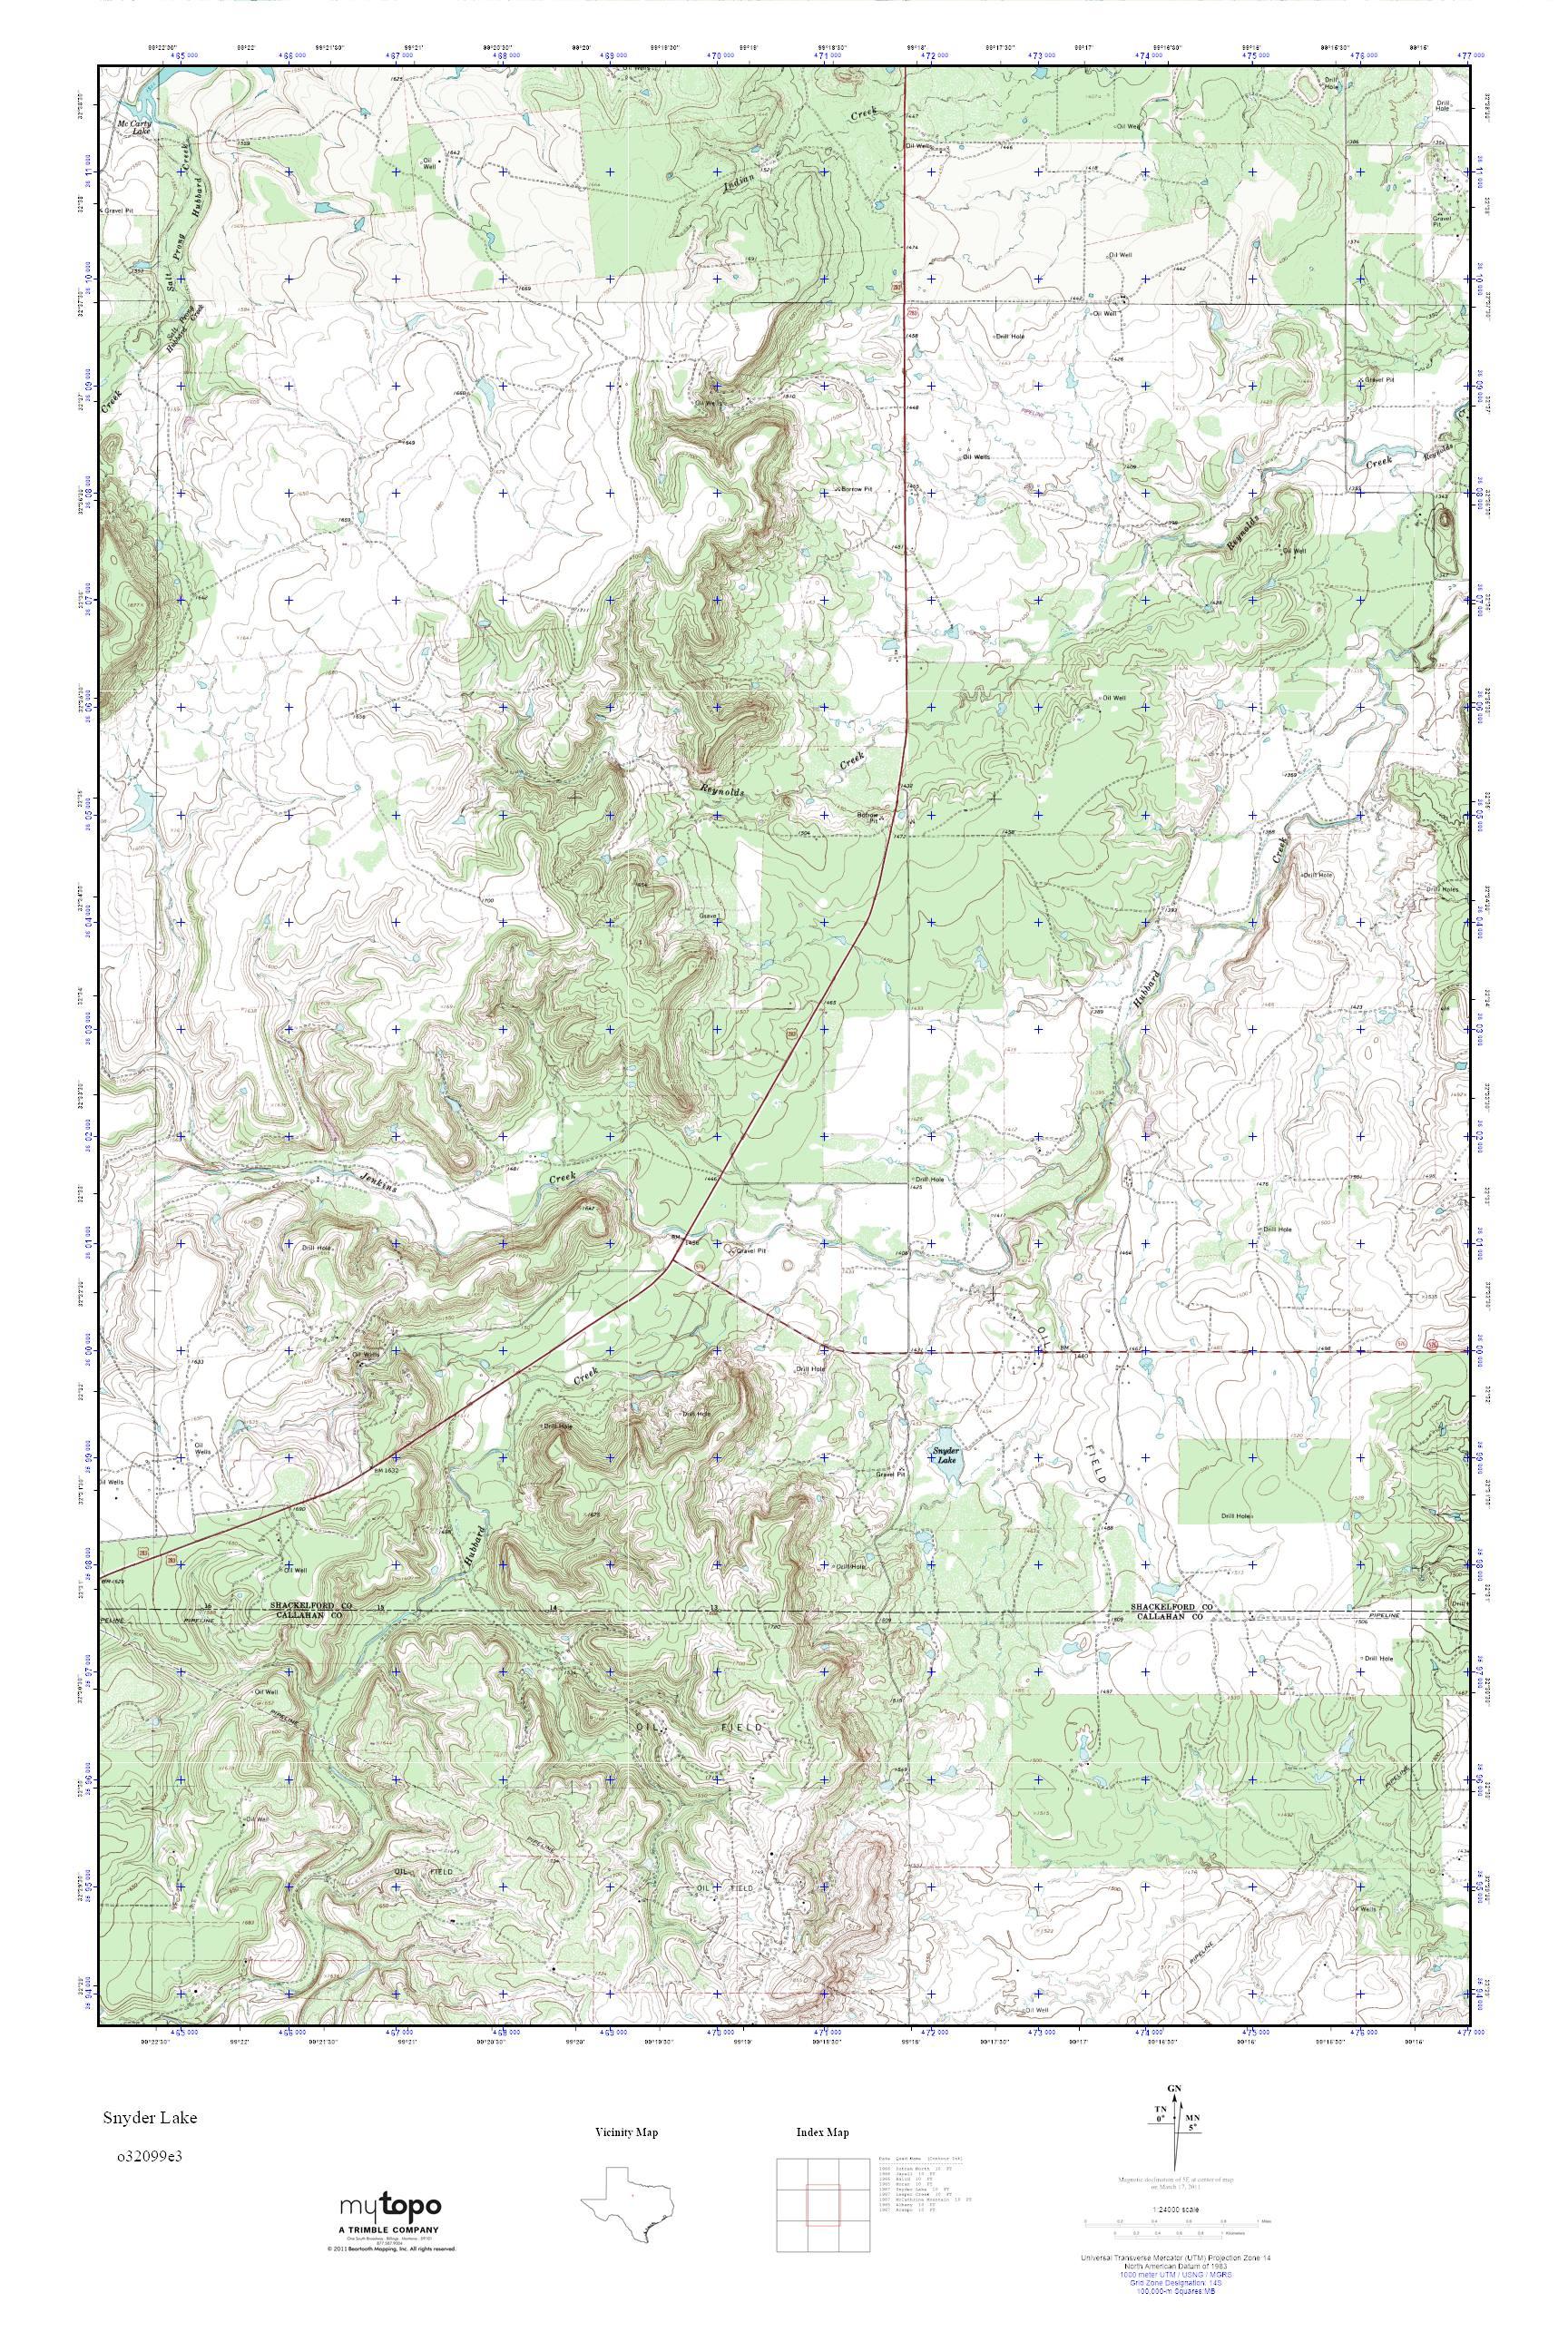 Mytopo Snyder Lake, Texas Usgs Quad Topo Map - Snyder Texas Map